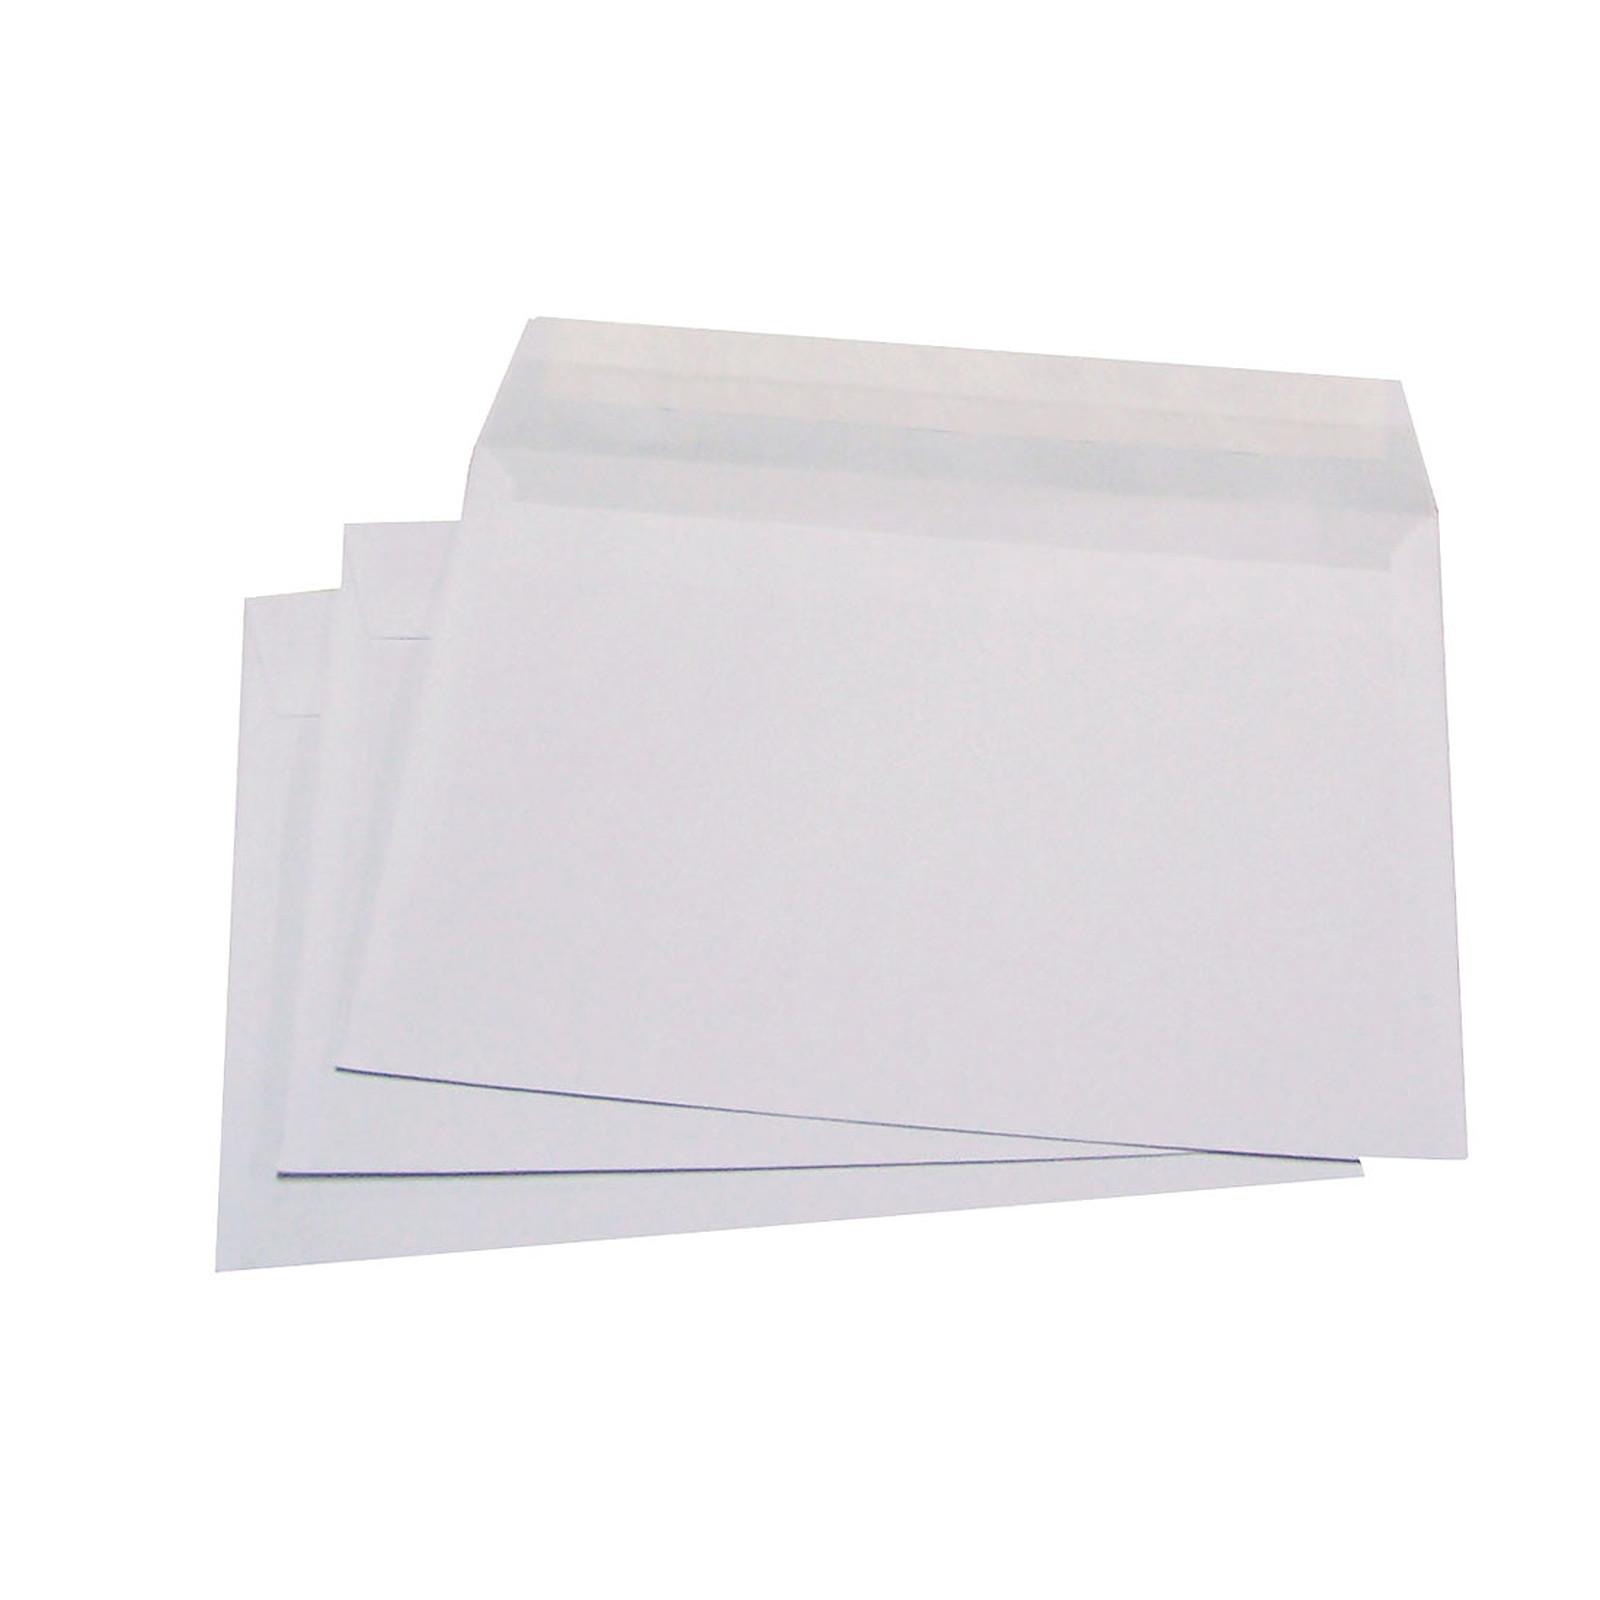 500 enveloppes C5 auto-adhésives 80g pleine